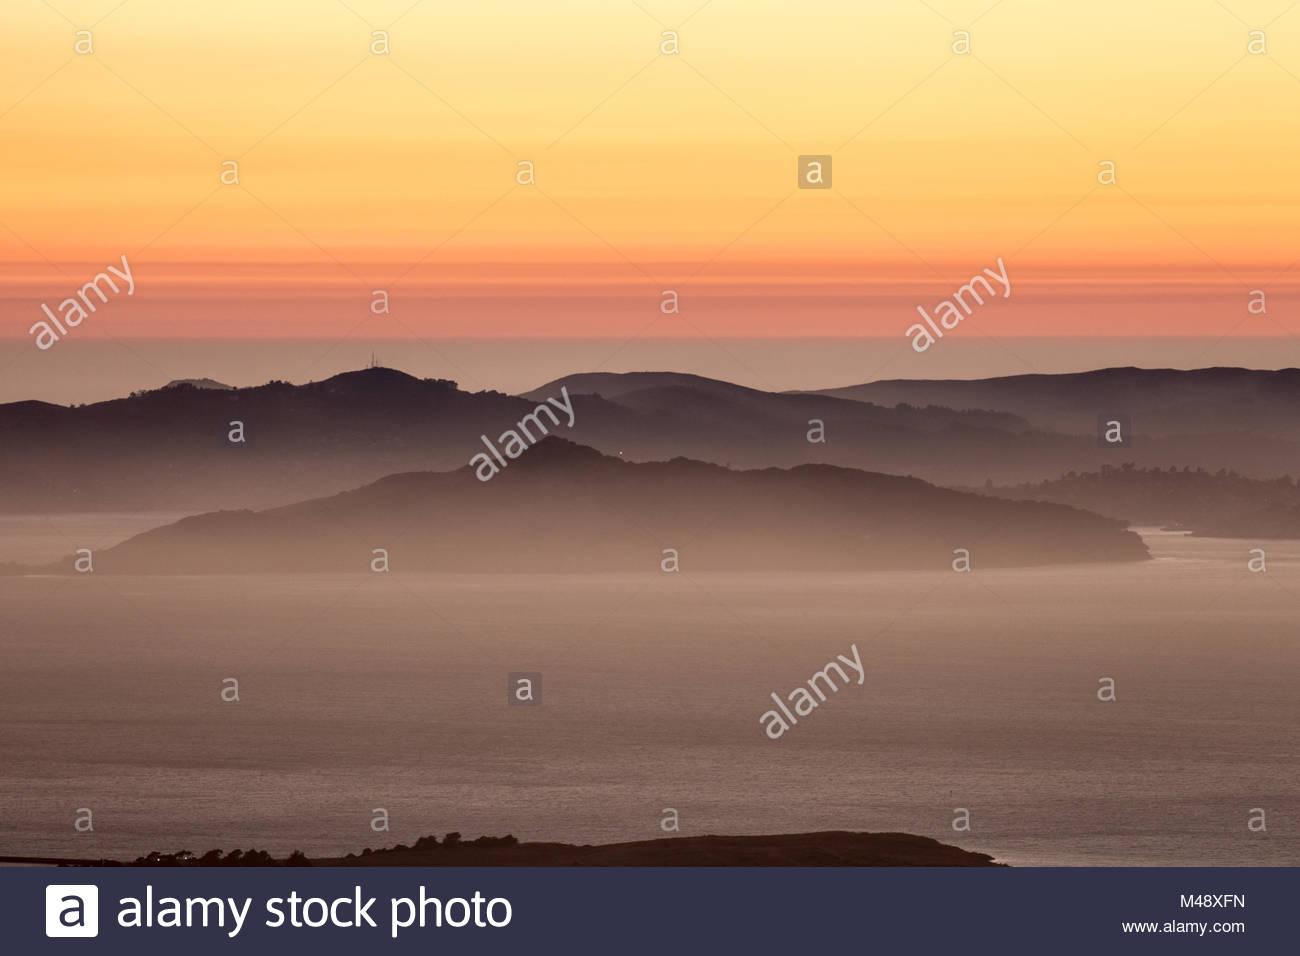 Hazy sunset over the Hills of Marin County, California Stock Photo